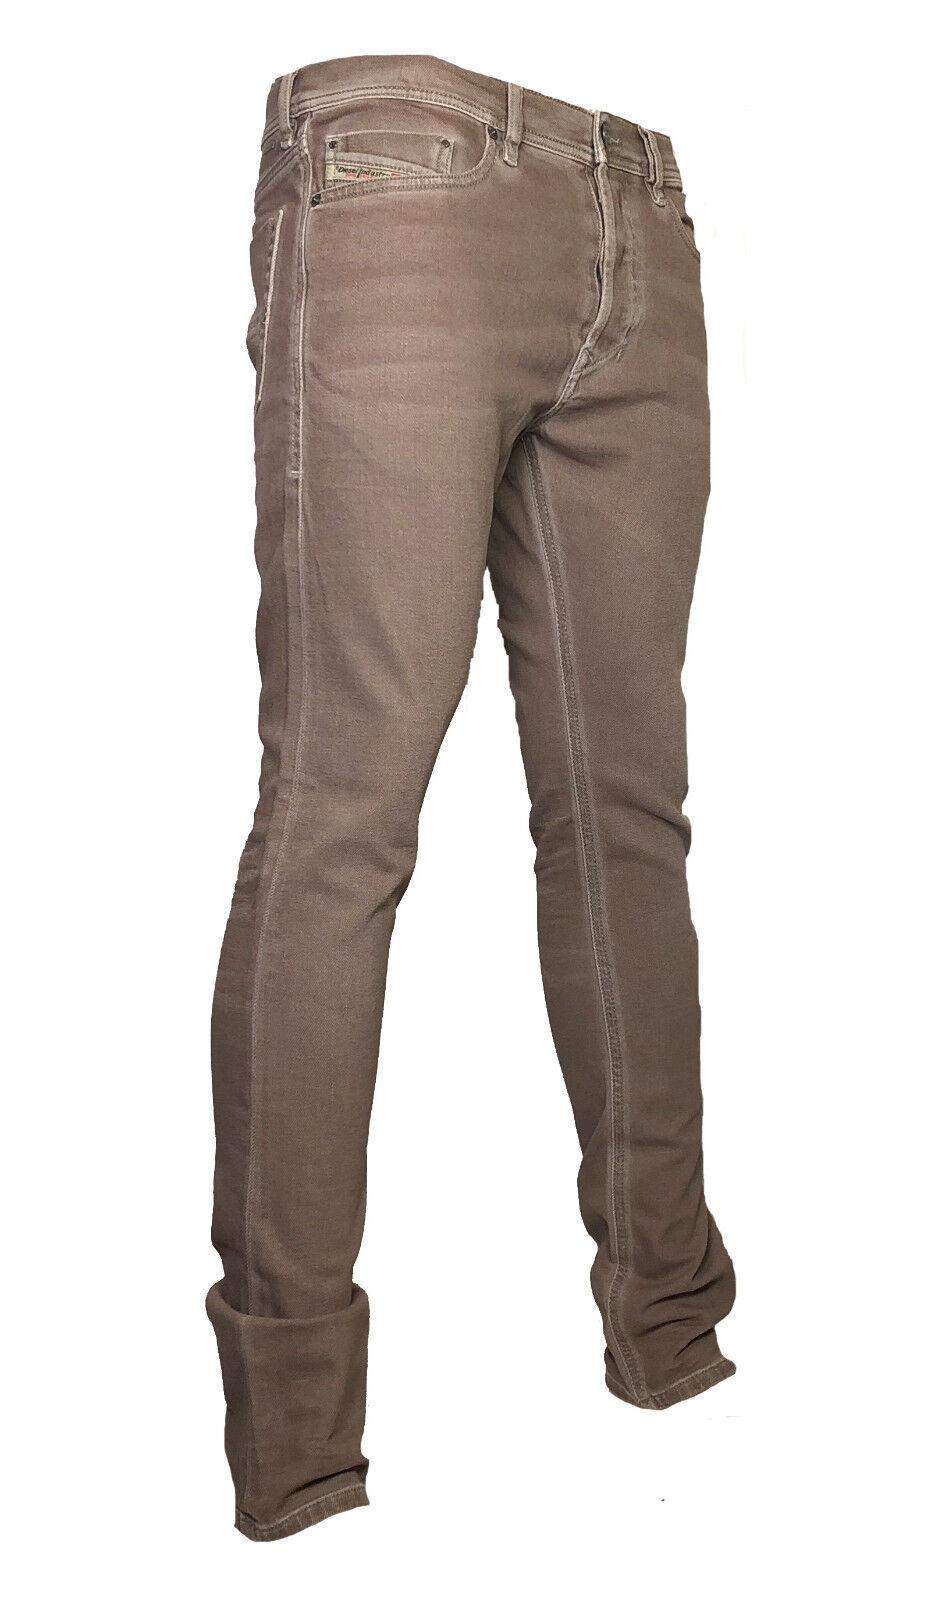 Diesel Herren Stretch Jeans TEPPHAR 0850Y Farbe 73C camel Gr. 31 32 NEU